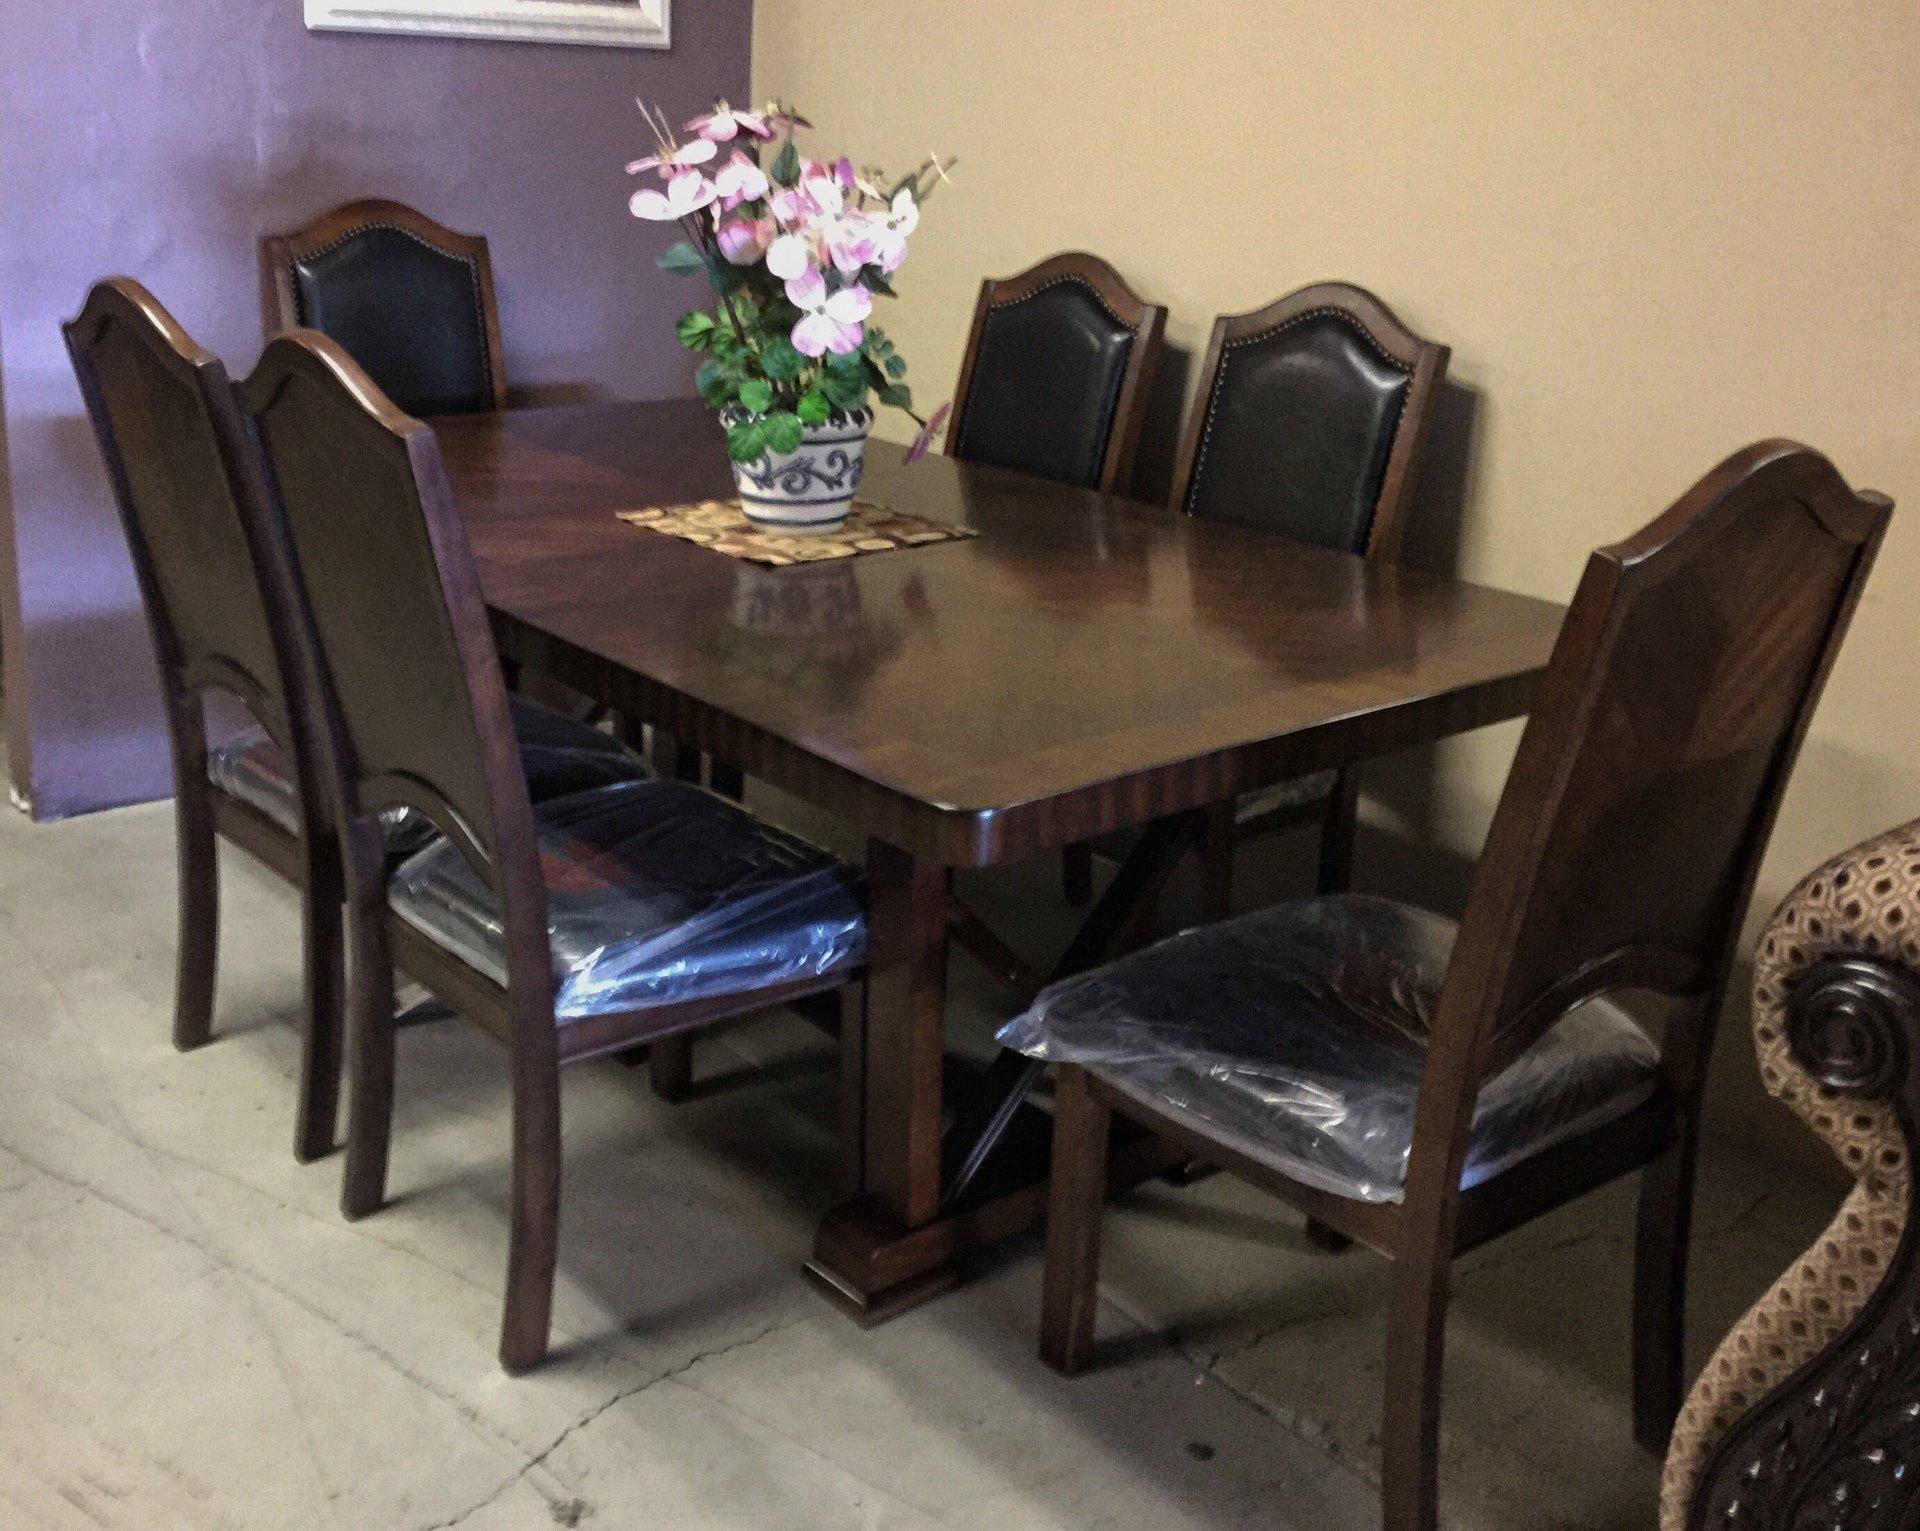 Affordable, Lasting Furniture & Décor